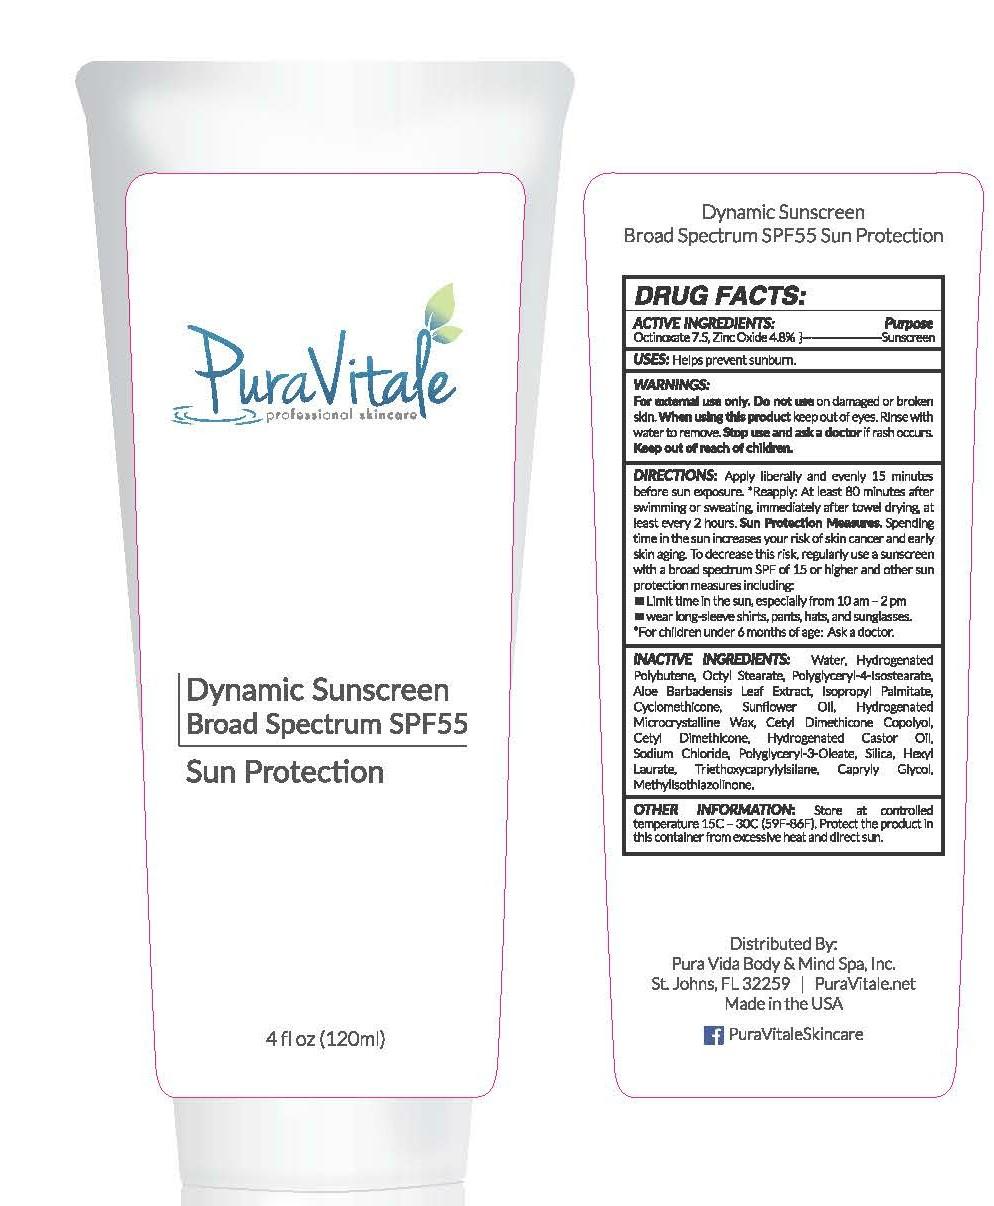 Pura Vitale Professional Skincare Dynamic Sunscreen Broad Spectrum Sun Protection SPF 55 Sun Protection 4 fl oz (120ml)